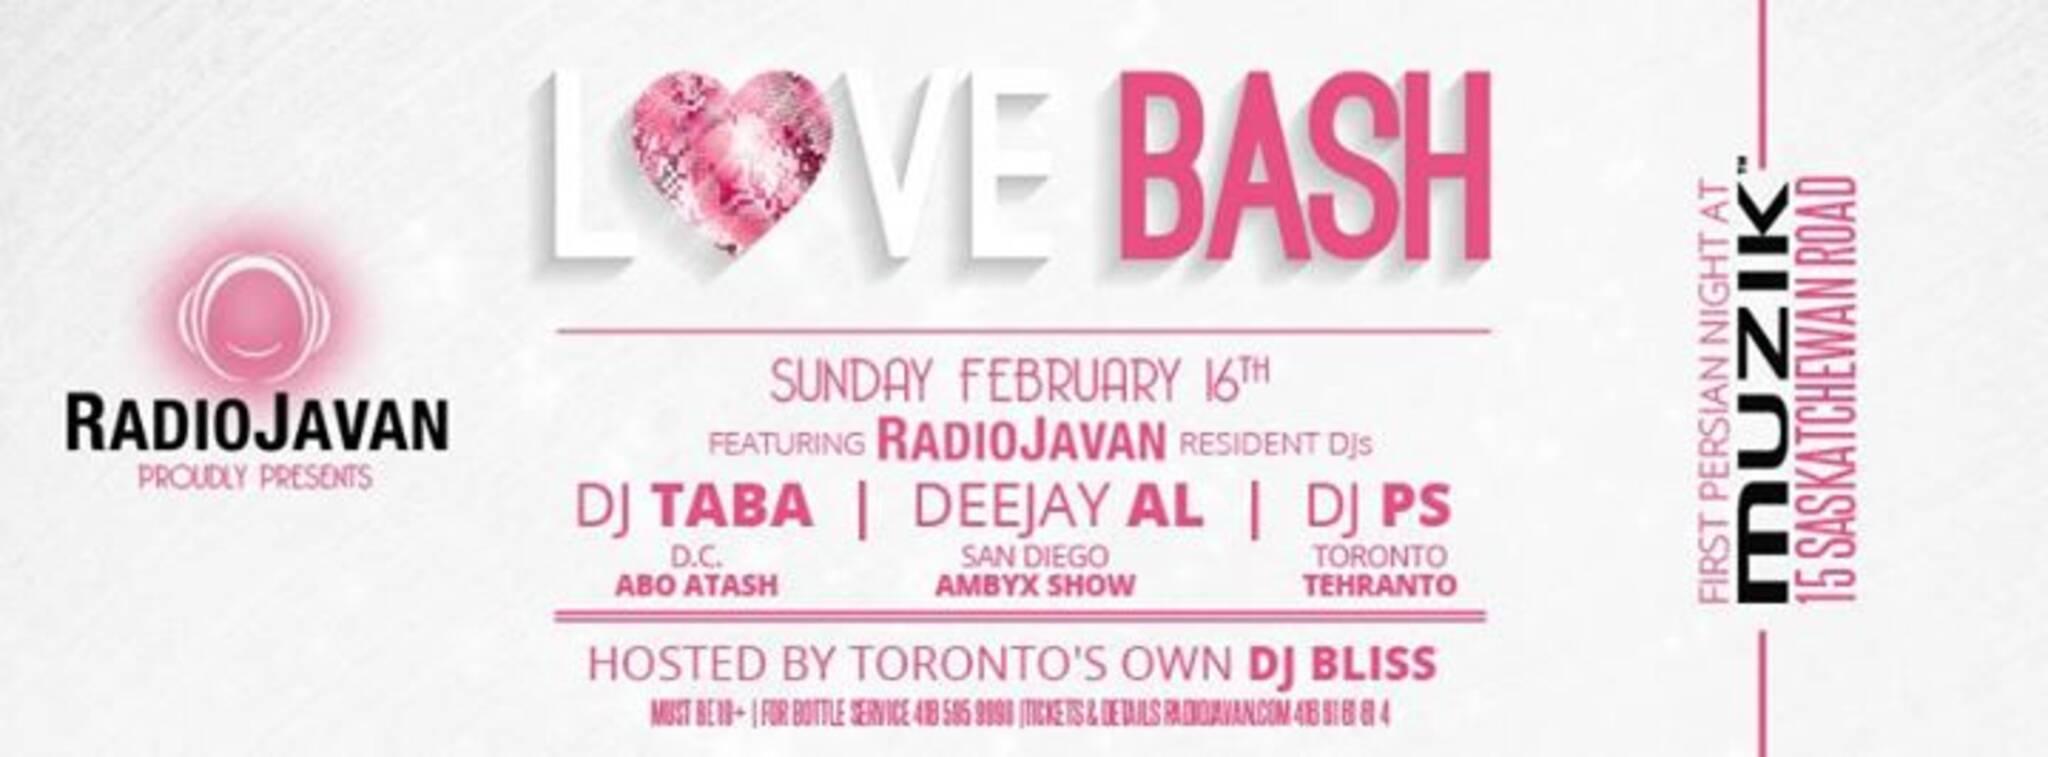 RADIO JAVAN @ MUZIK Nightclub - LOVE BASH